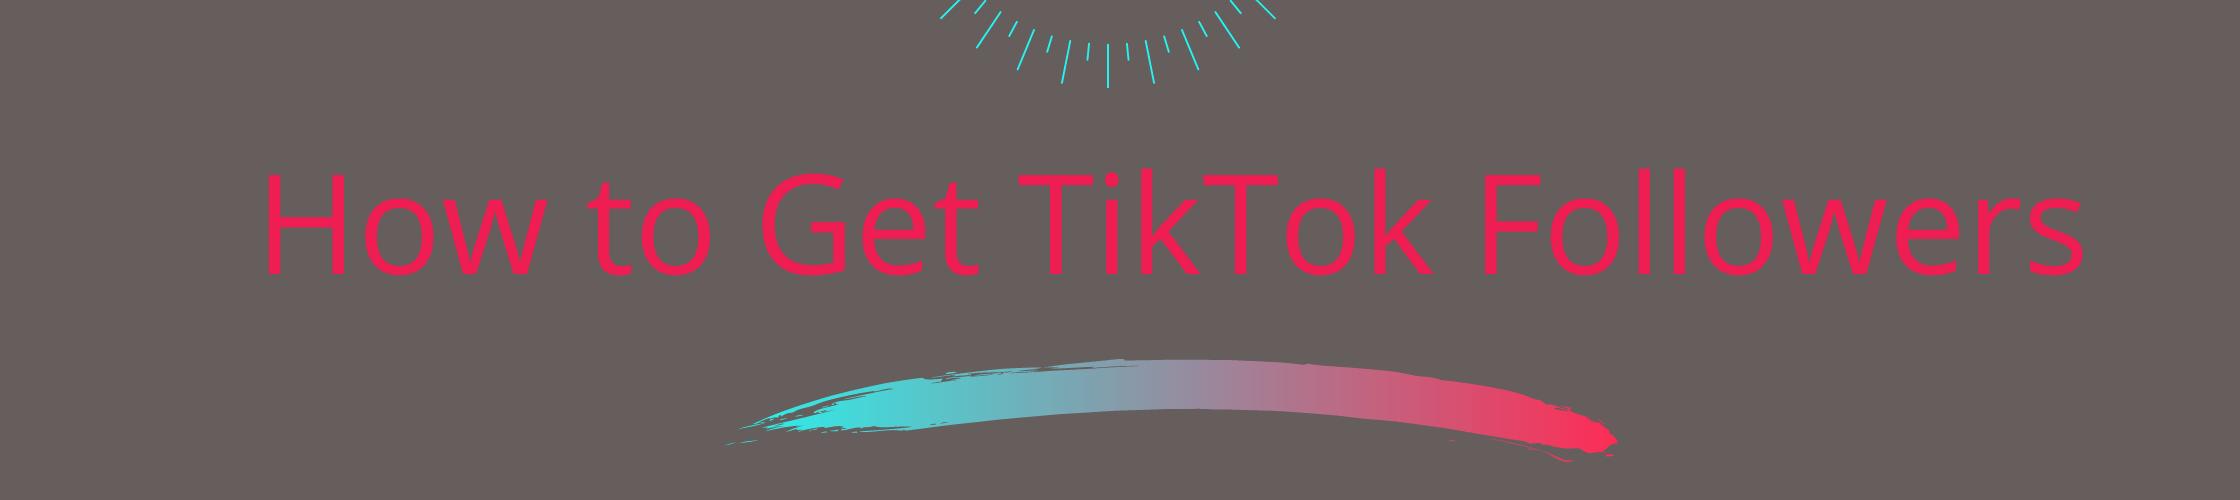 How to Get TikTok Followers